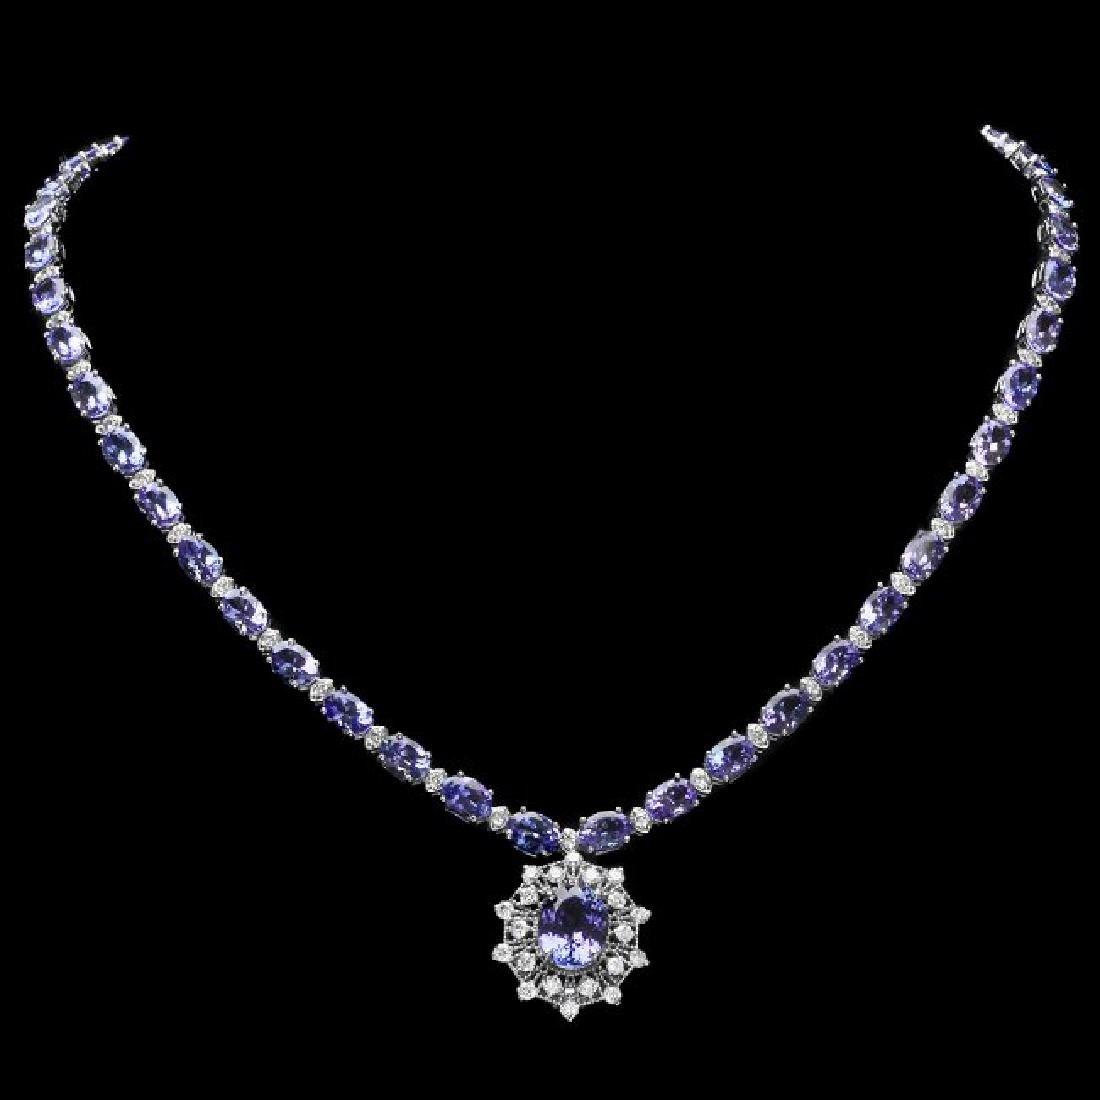 14k Gold 34.5ct Tanzanite 2.80ct Diamond Necklace - 2